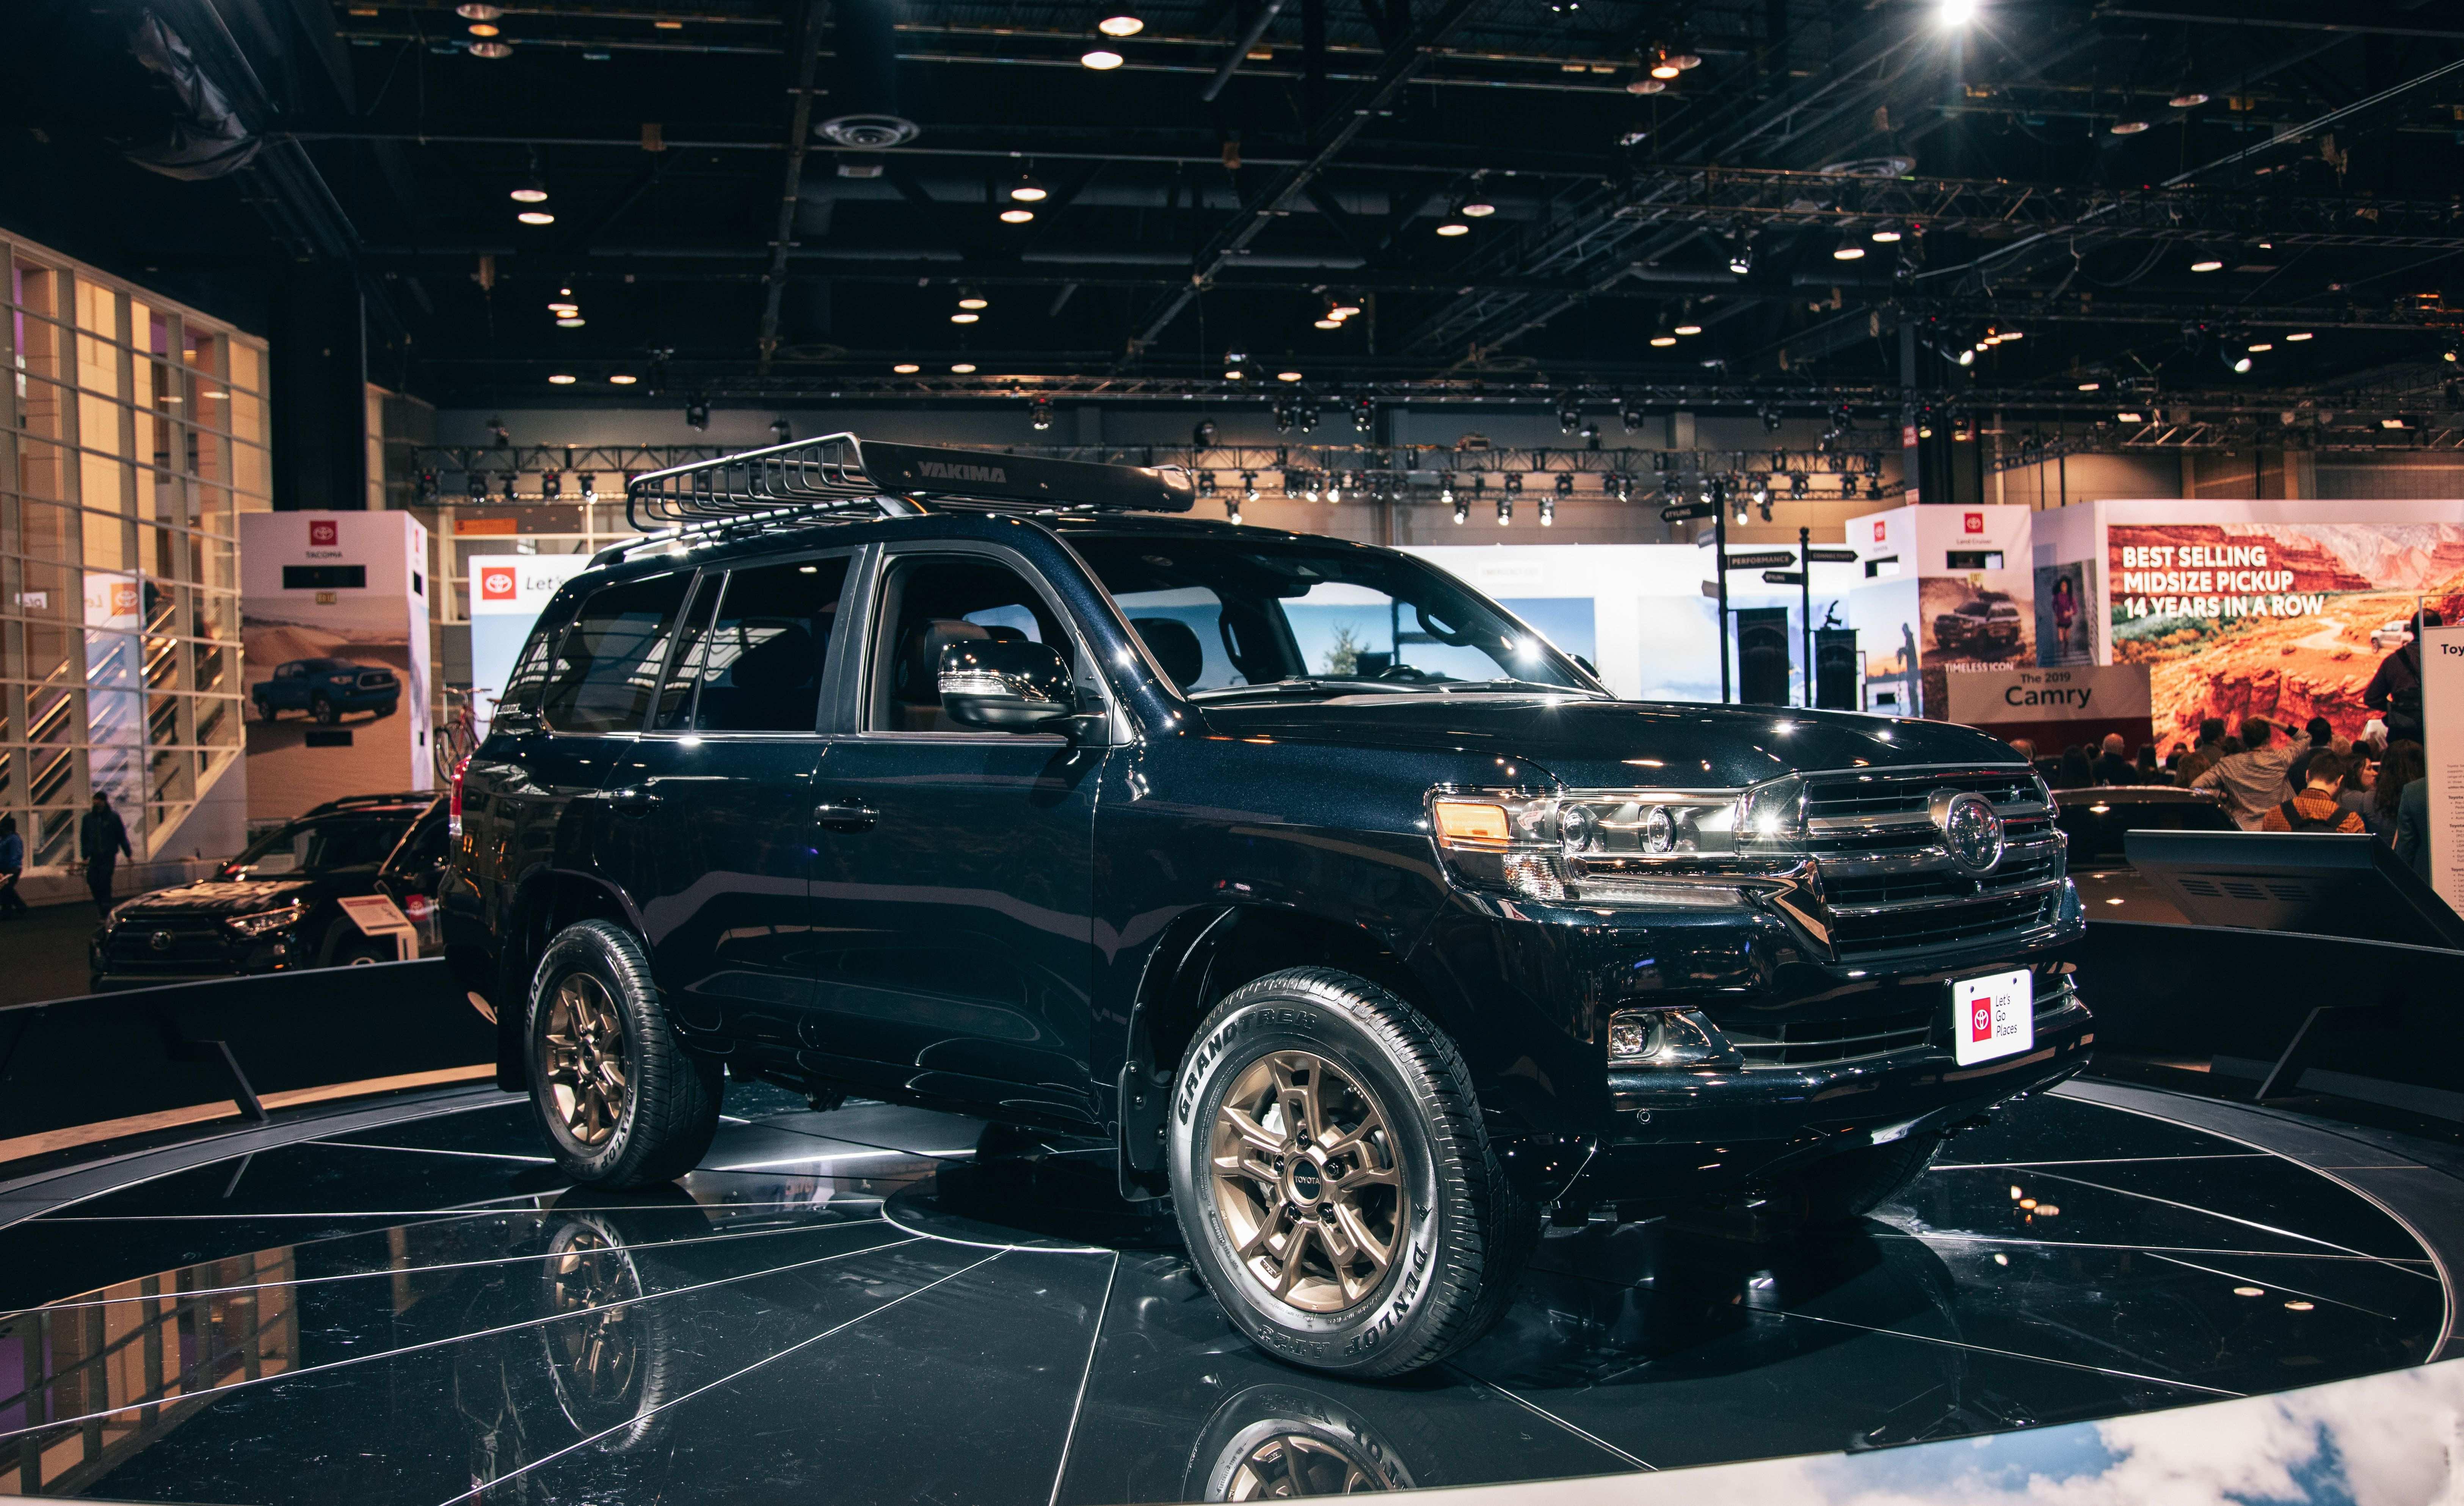 48 Great Best Toyota Land Cruiser Zx 2019 Performance Release Date for Best Toyota Land Cruiser Zx 2019 Performance